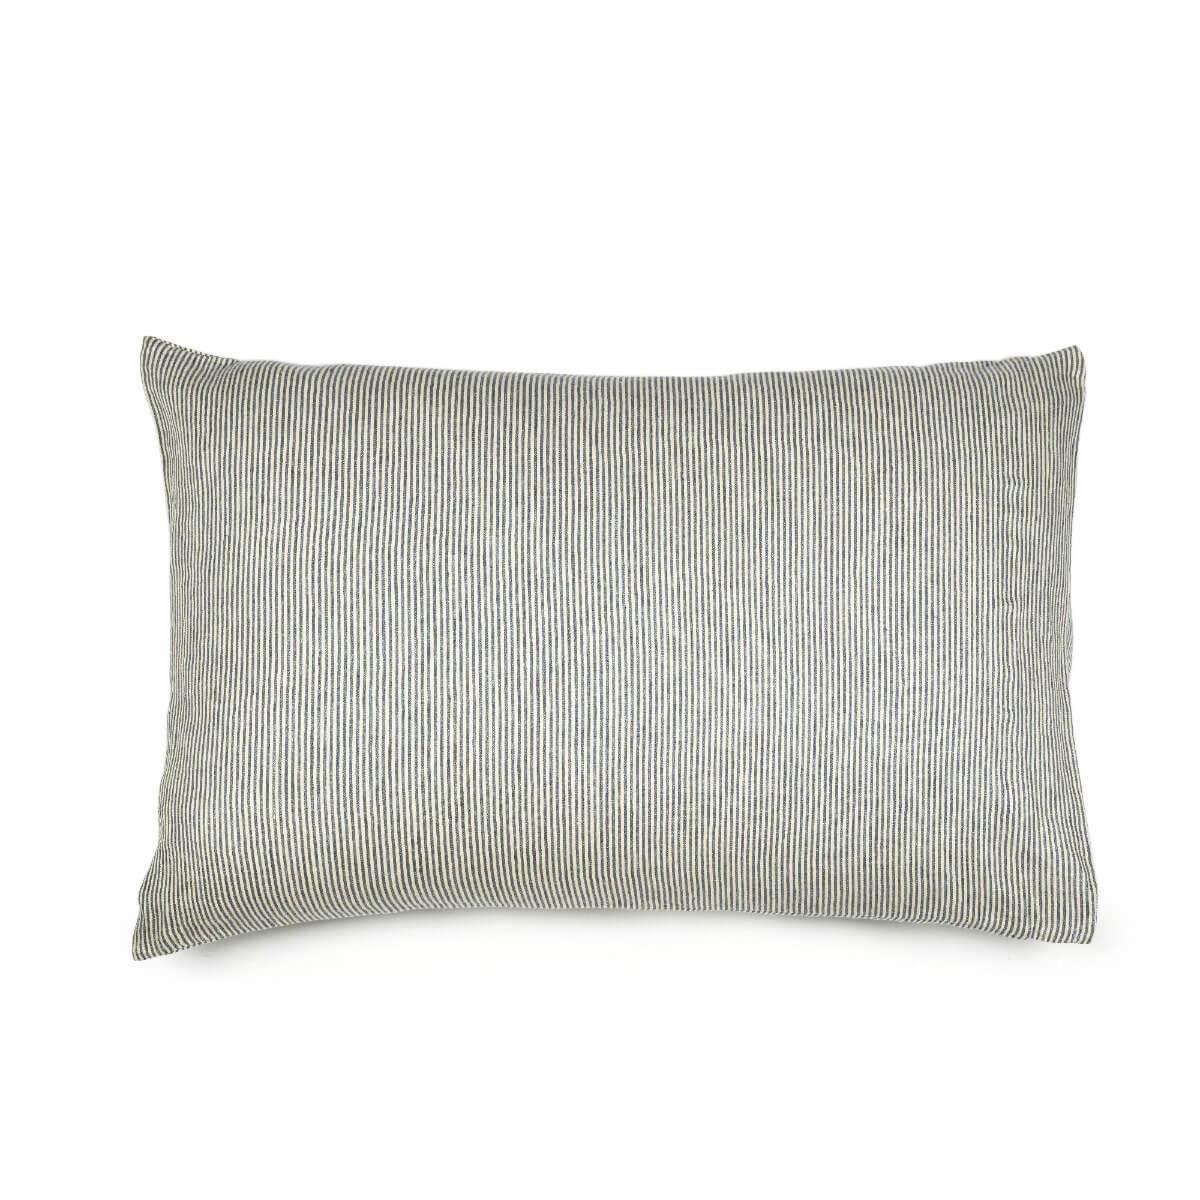 Pillow Sham - The Workshop Stripe-2